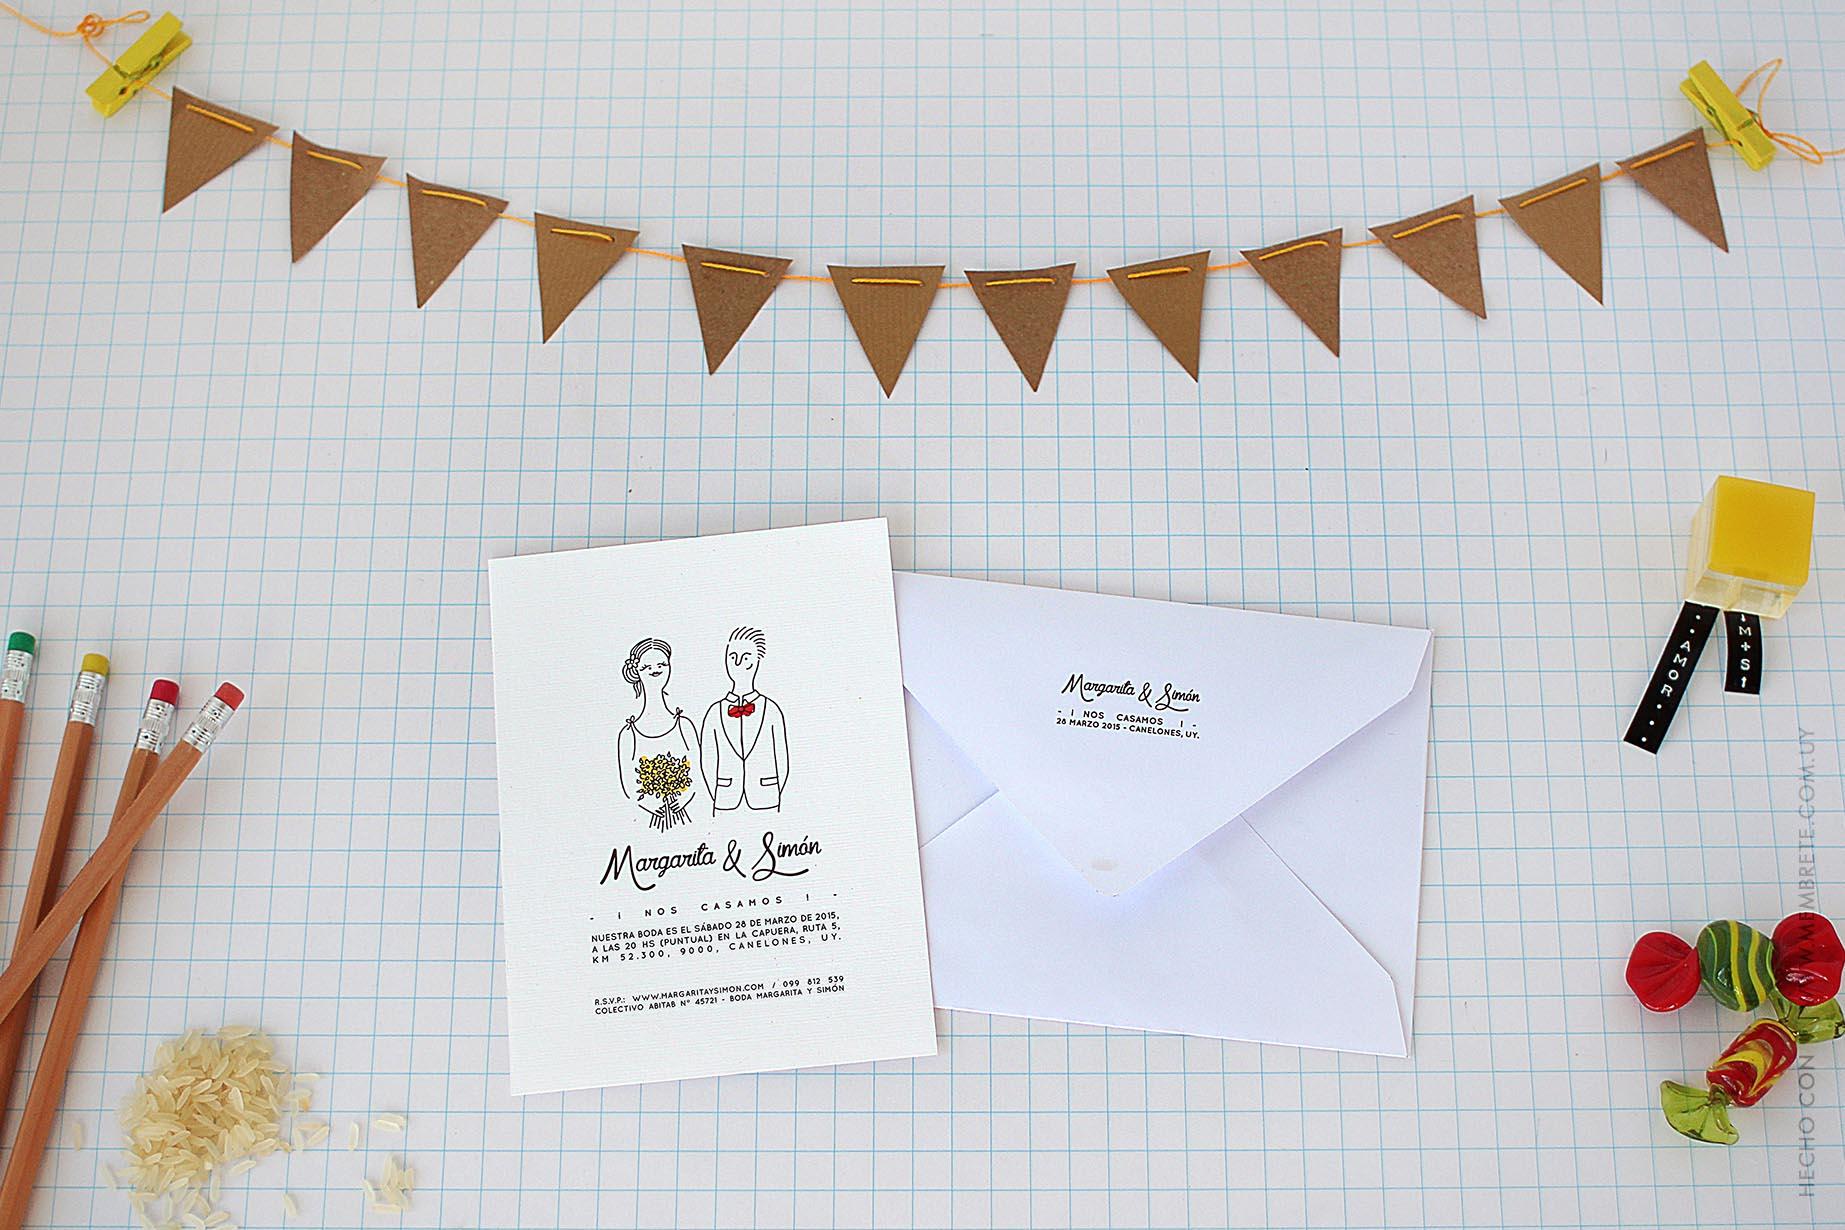 Margarita & Simón ♥ Membrete   Invitaciones en papel   www.membrete.com.uy